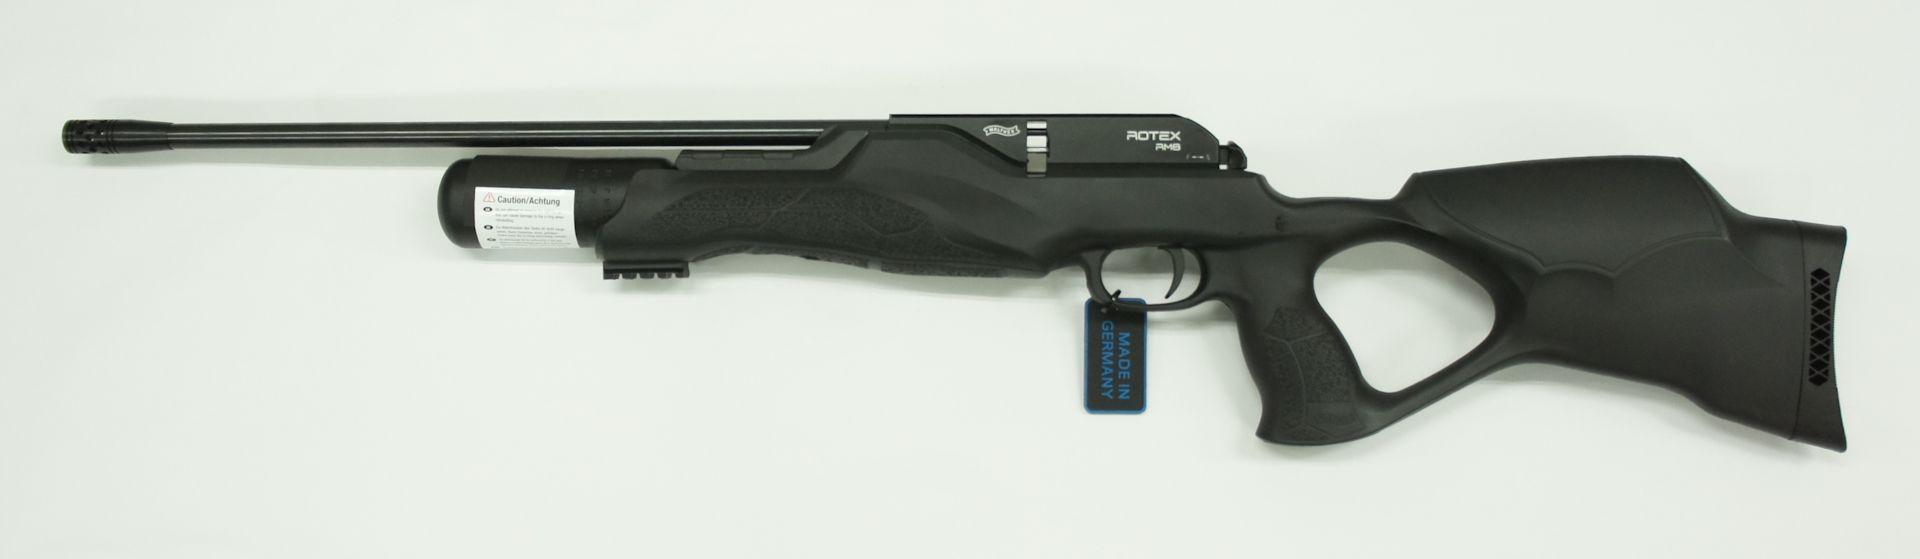 Walther Rotex RM8 varmint , Kunststoffschaft Kaliber  4,5mm